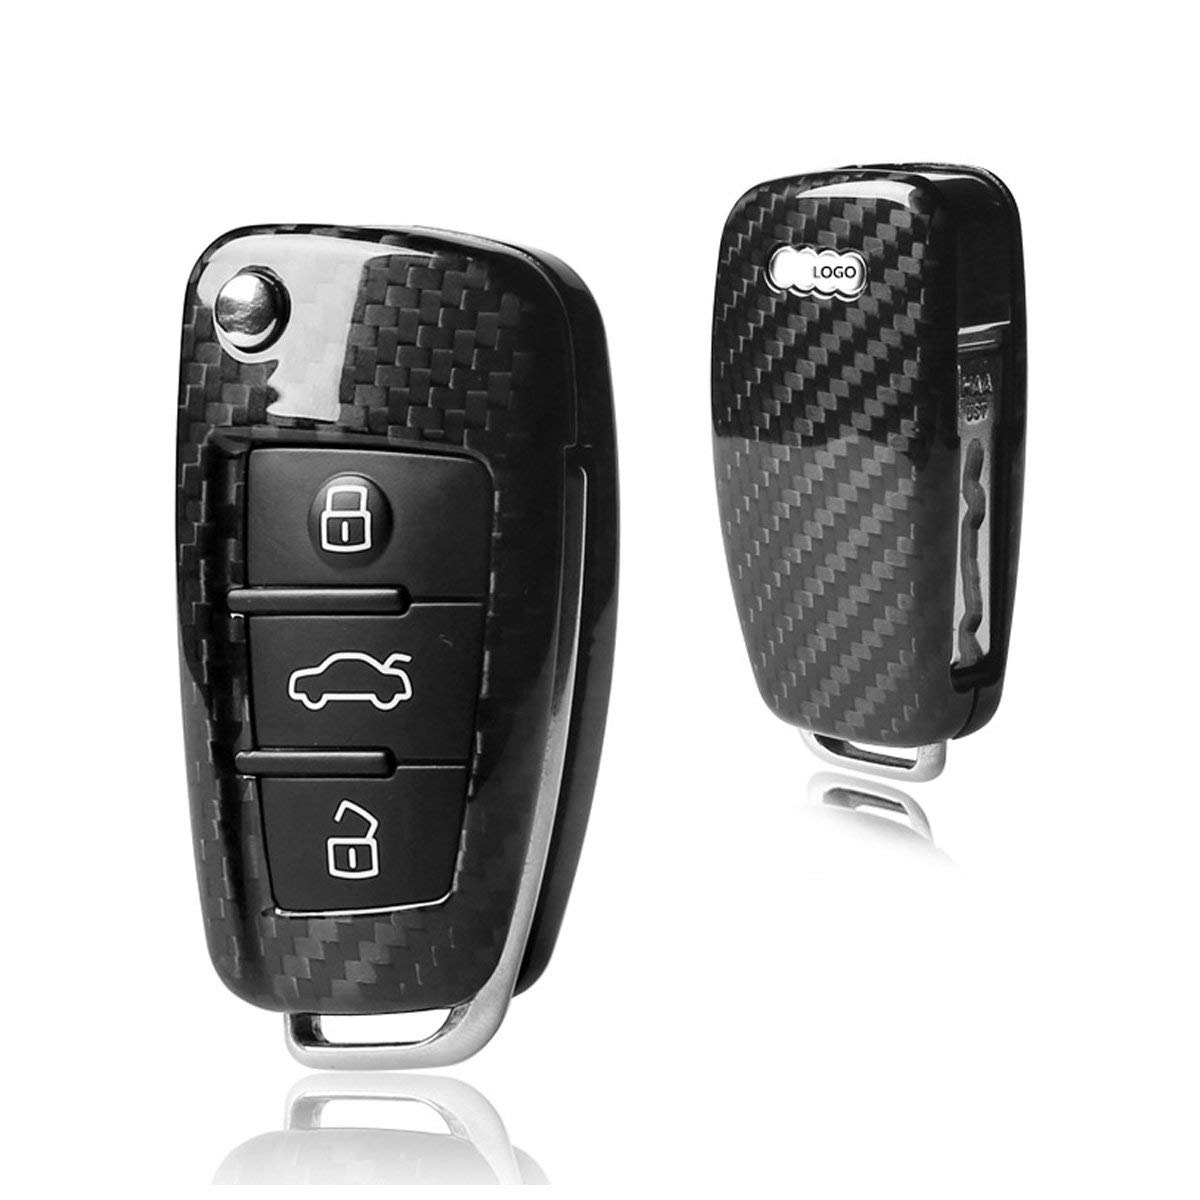 MODIPIM Keyless Entry Remote Cover Carbon Fiber Key Case Fob Holder Shell For Audi Q5 Q7 A4 A6 A1 A3 3-Buttons Flip Key Color Black